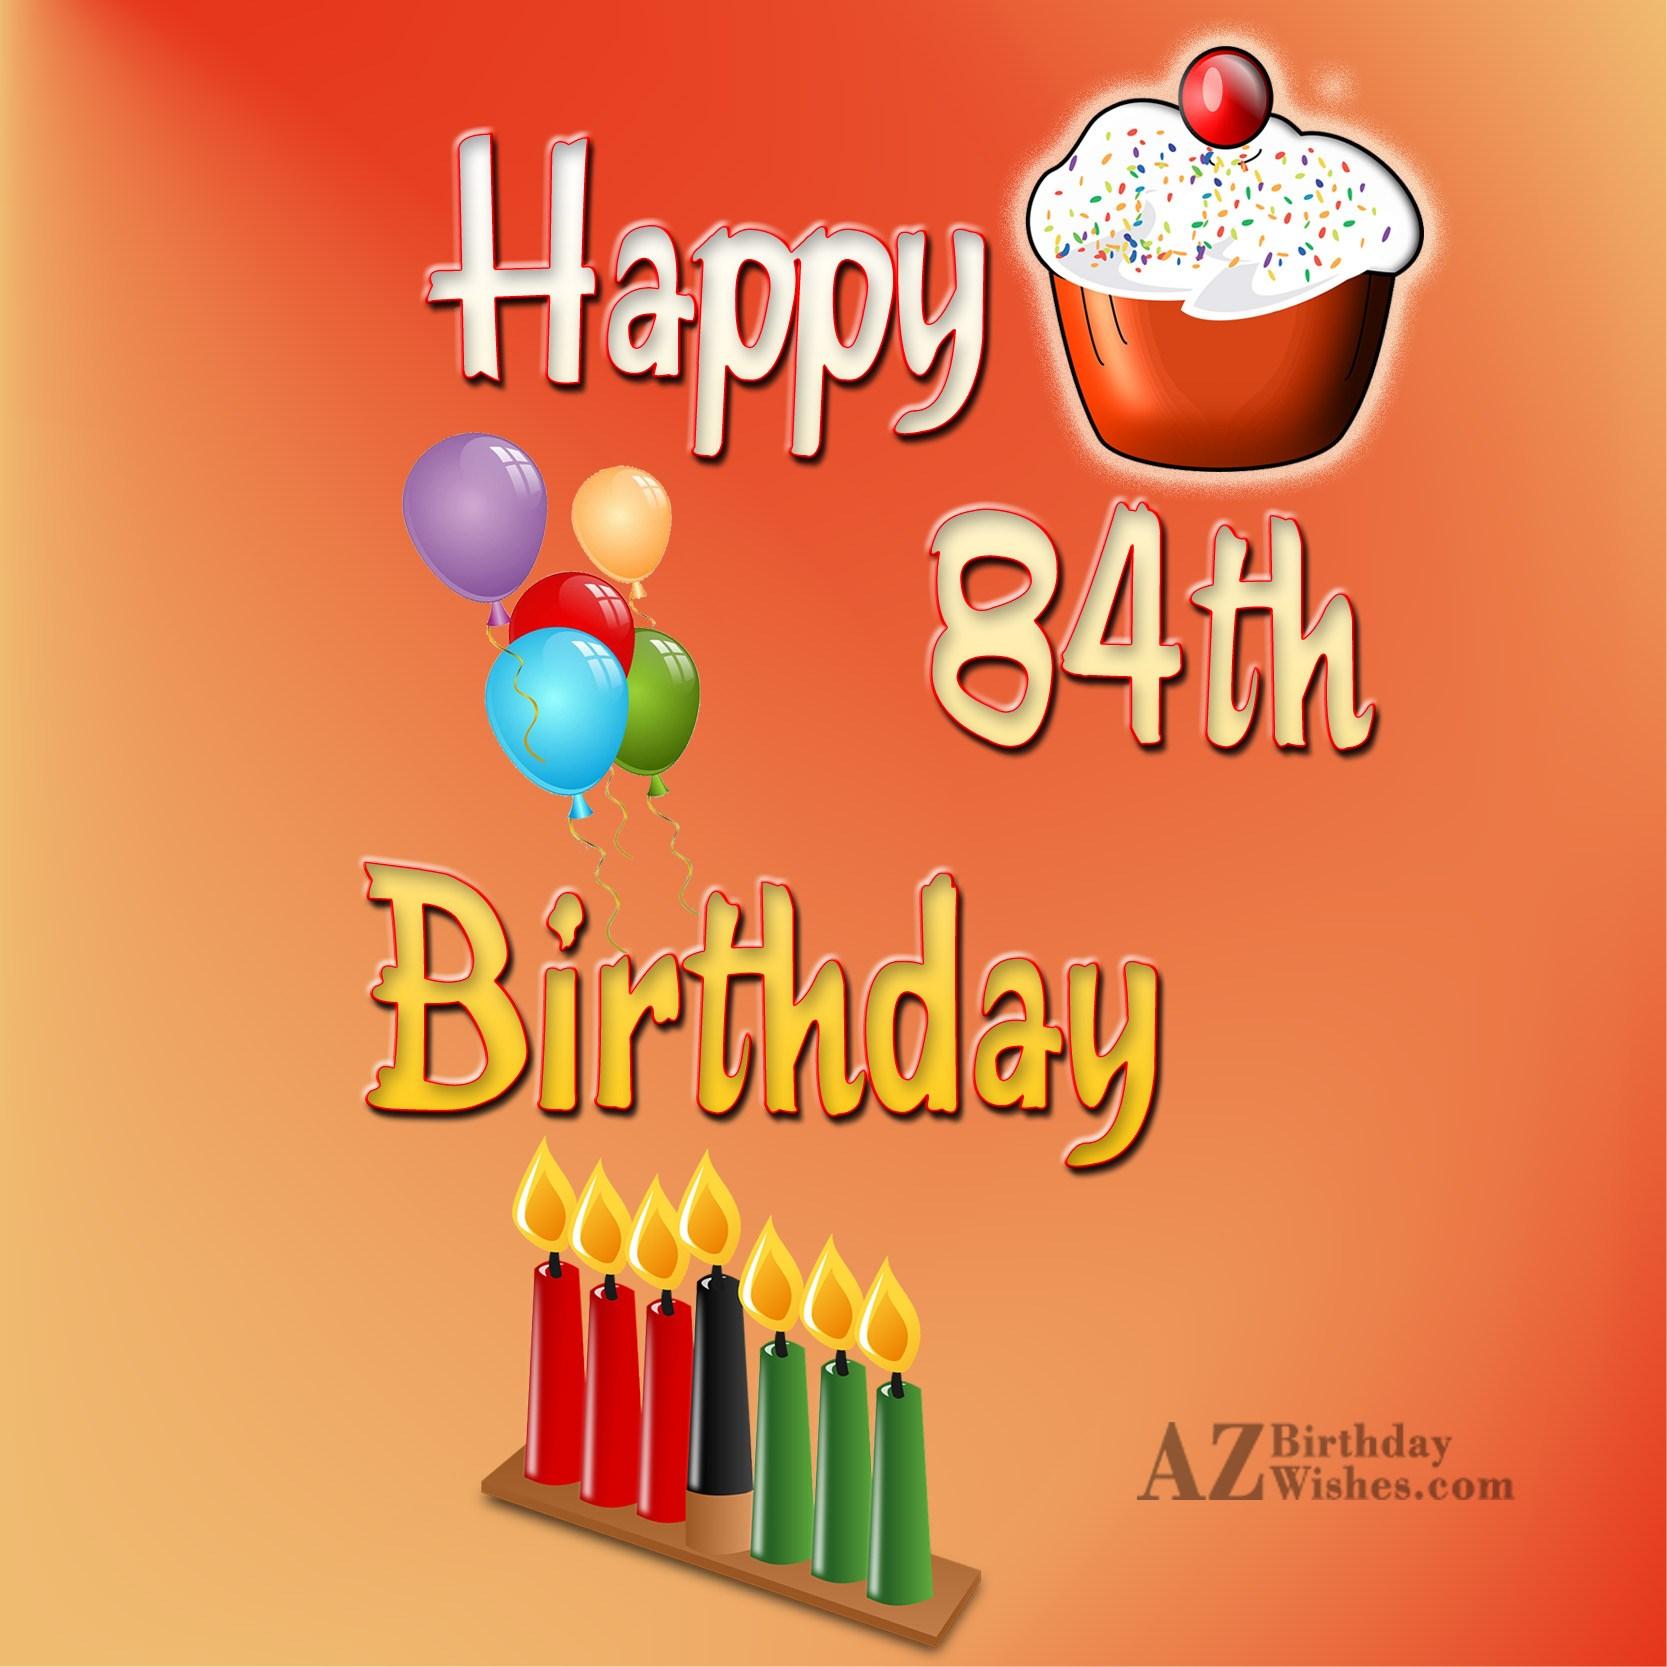 december birthday wishes